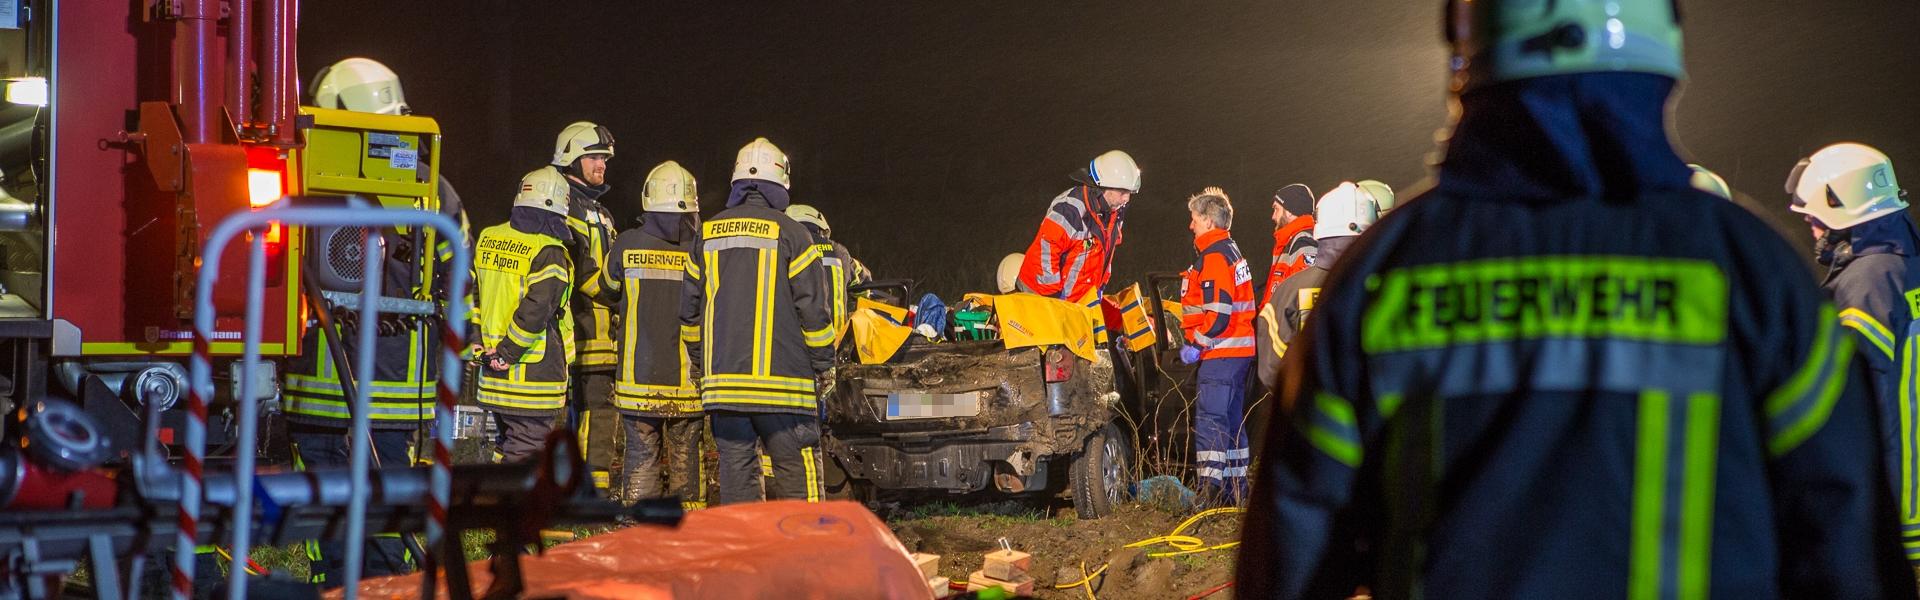 12.01.2017 – Schwierige Rettung nach Verkehrsunfall in Appen(PI)